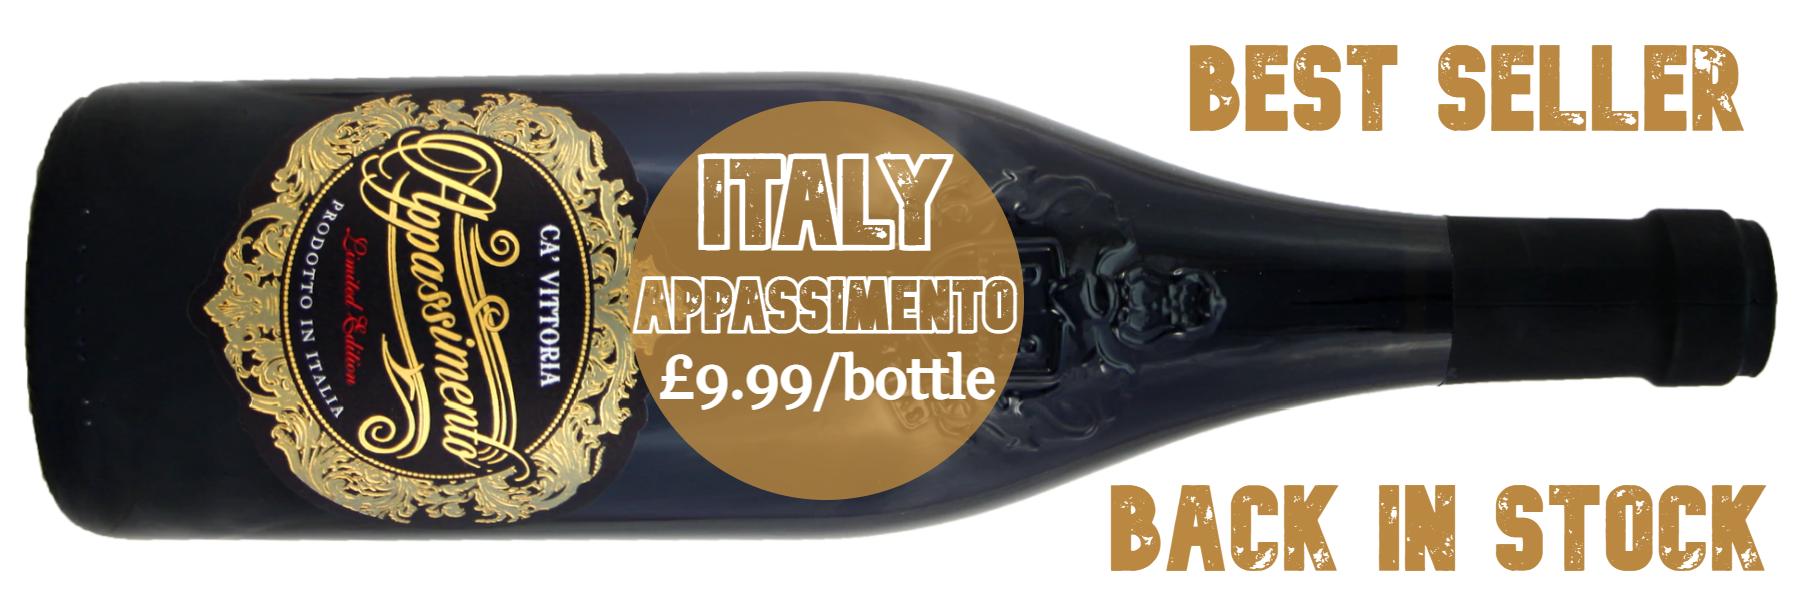 New 2020 vintage - Ca' Vittoria Appassimento £9.99/bottle